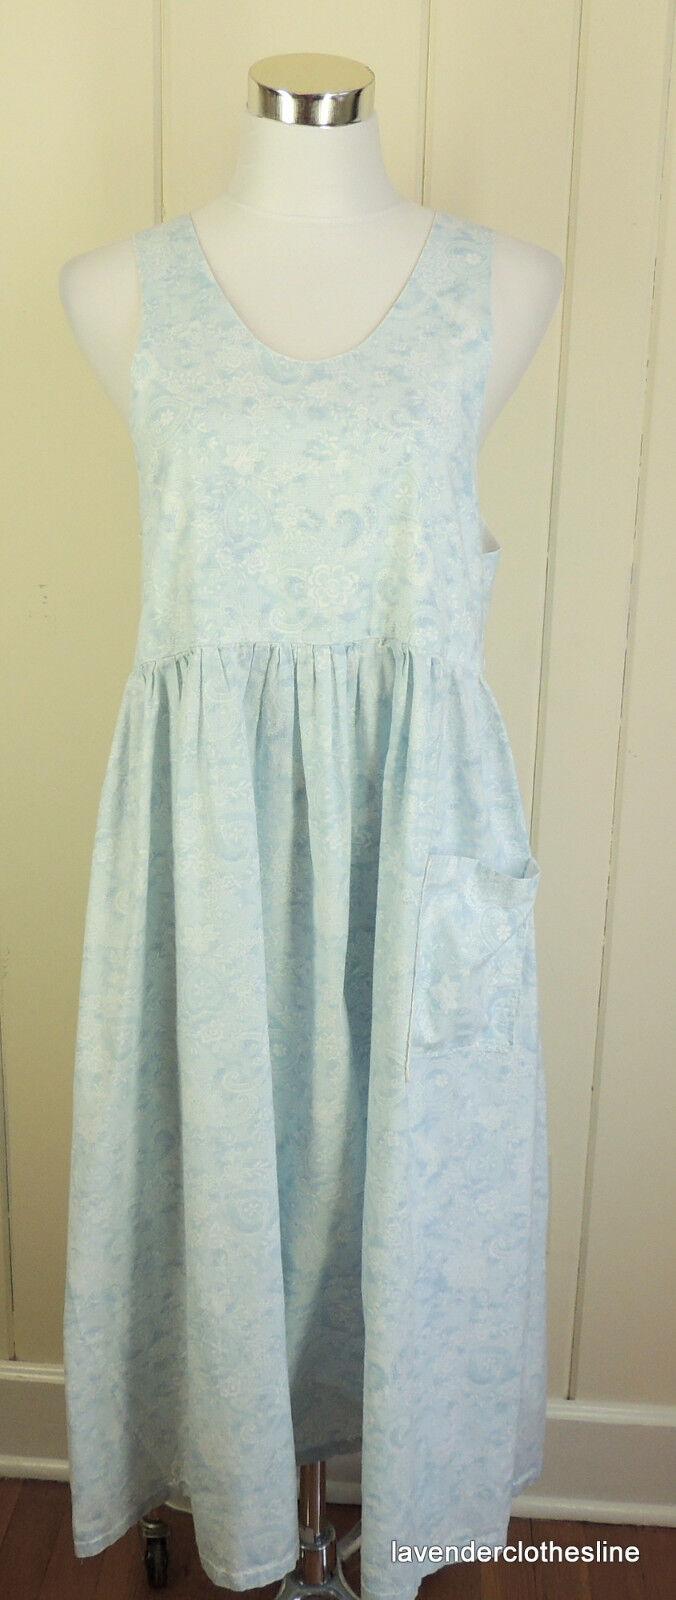 Handmade Homemade bluee Country Farm Chore Jumper Dress Bust 37   Length 46